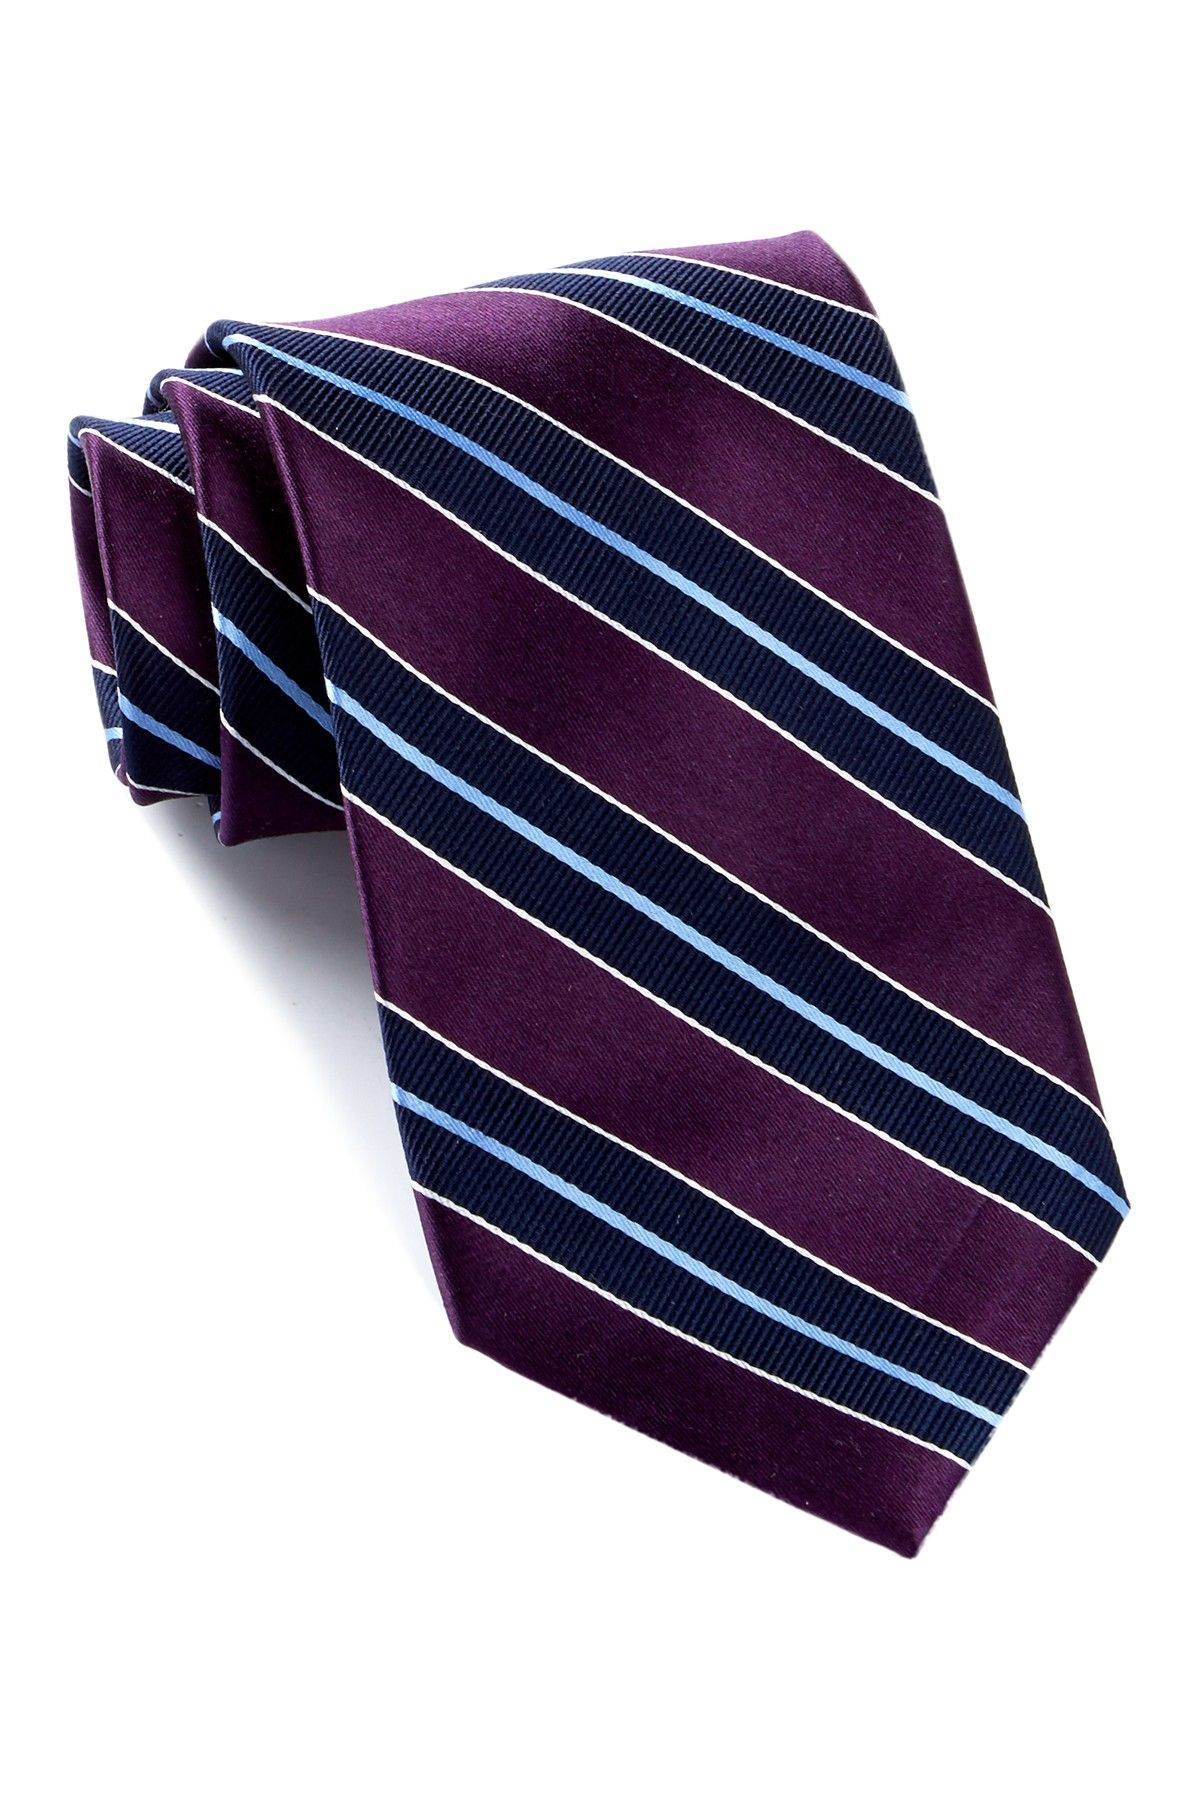 Jerome Stripe Tie by Nordstrom Rack on @nordstrom_rack